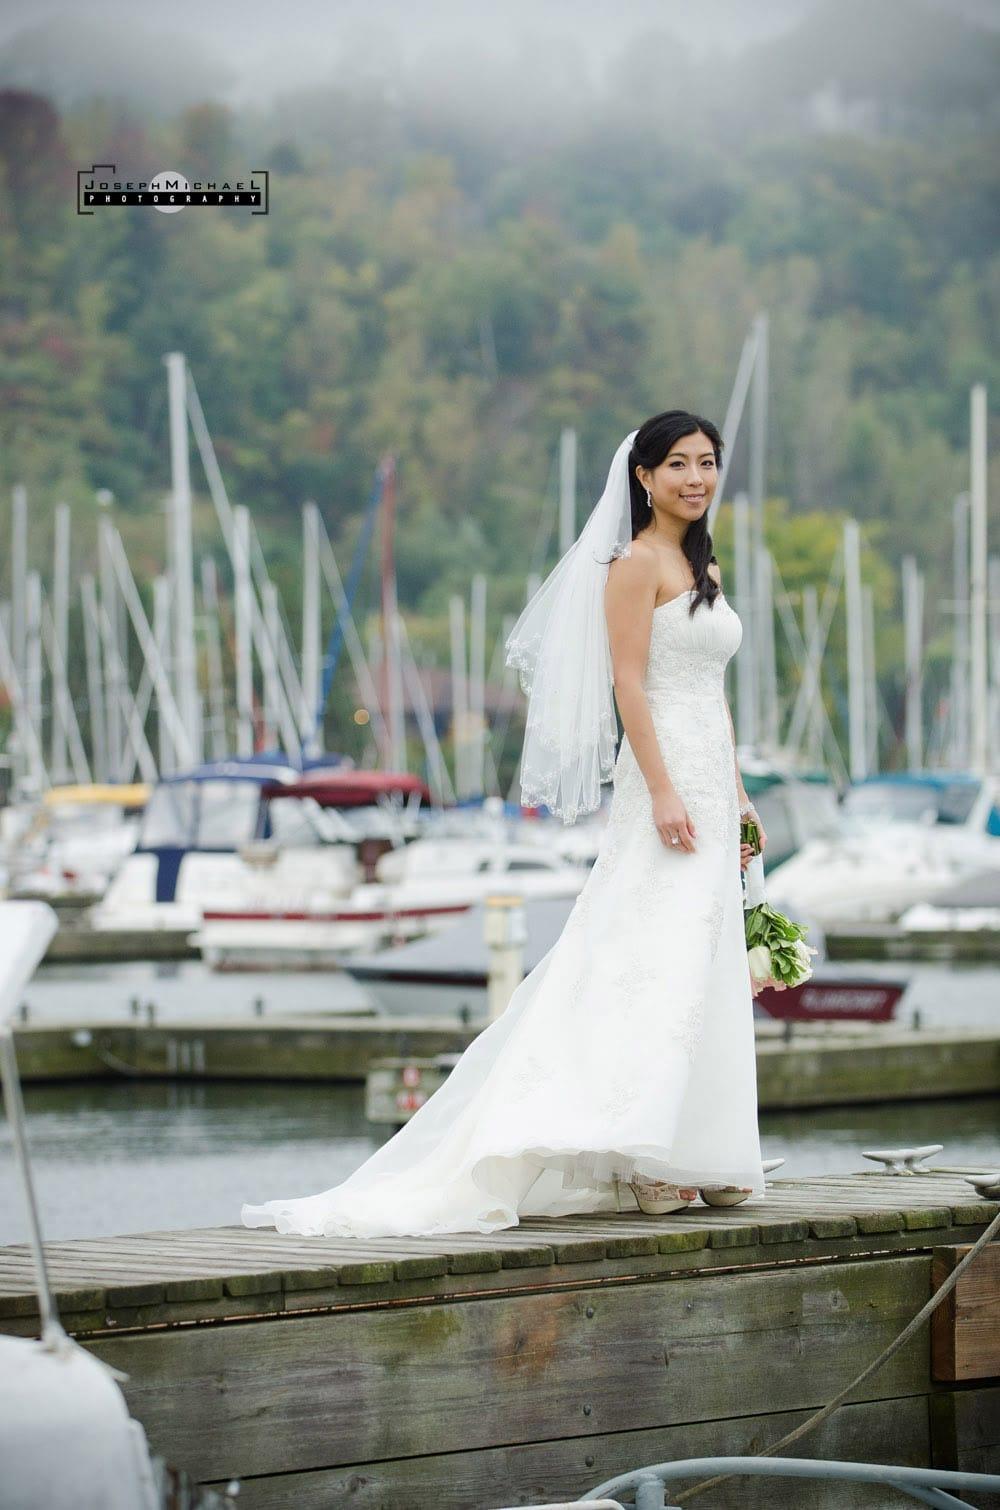 Wedding Photography at Bluffers Park Marina Toronto